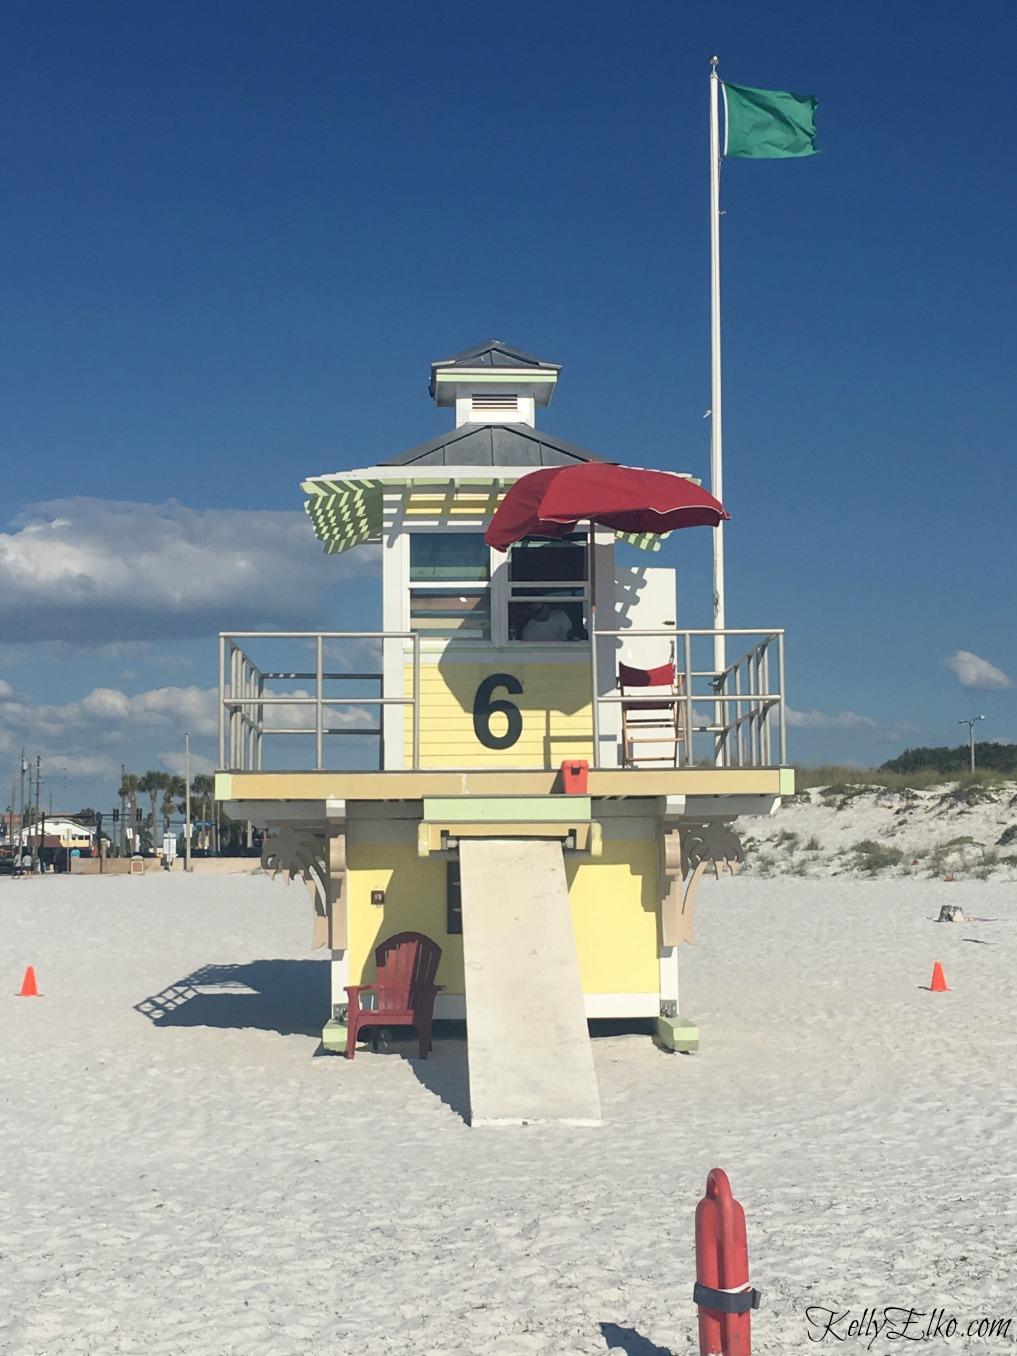 Clearwater Beach lifeguard stand kellyelko.com